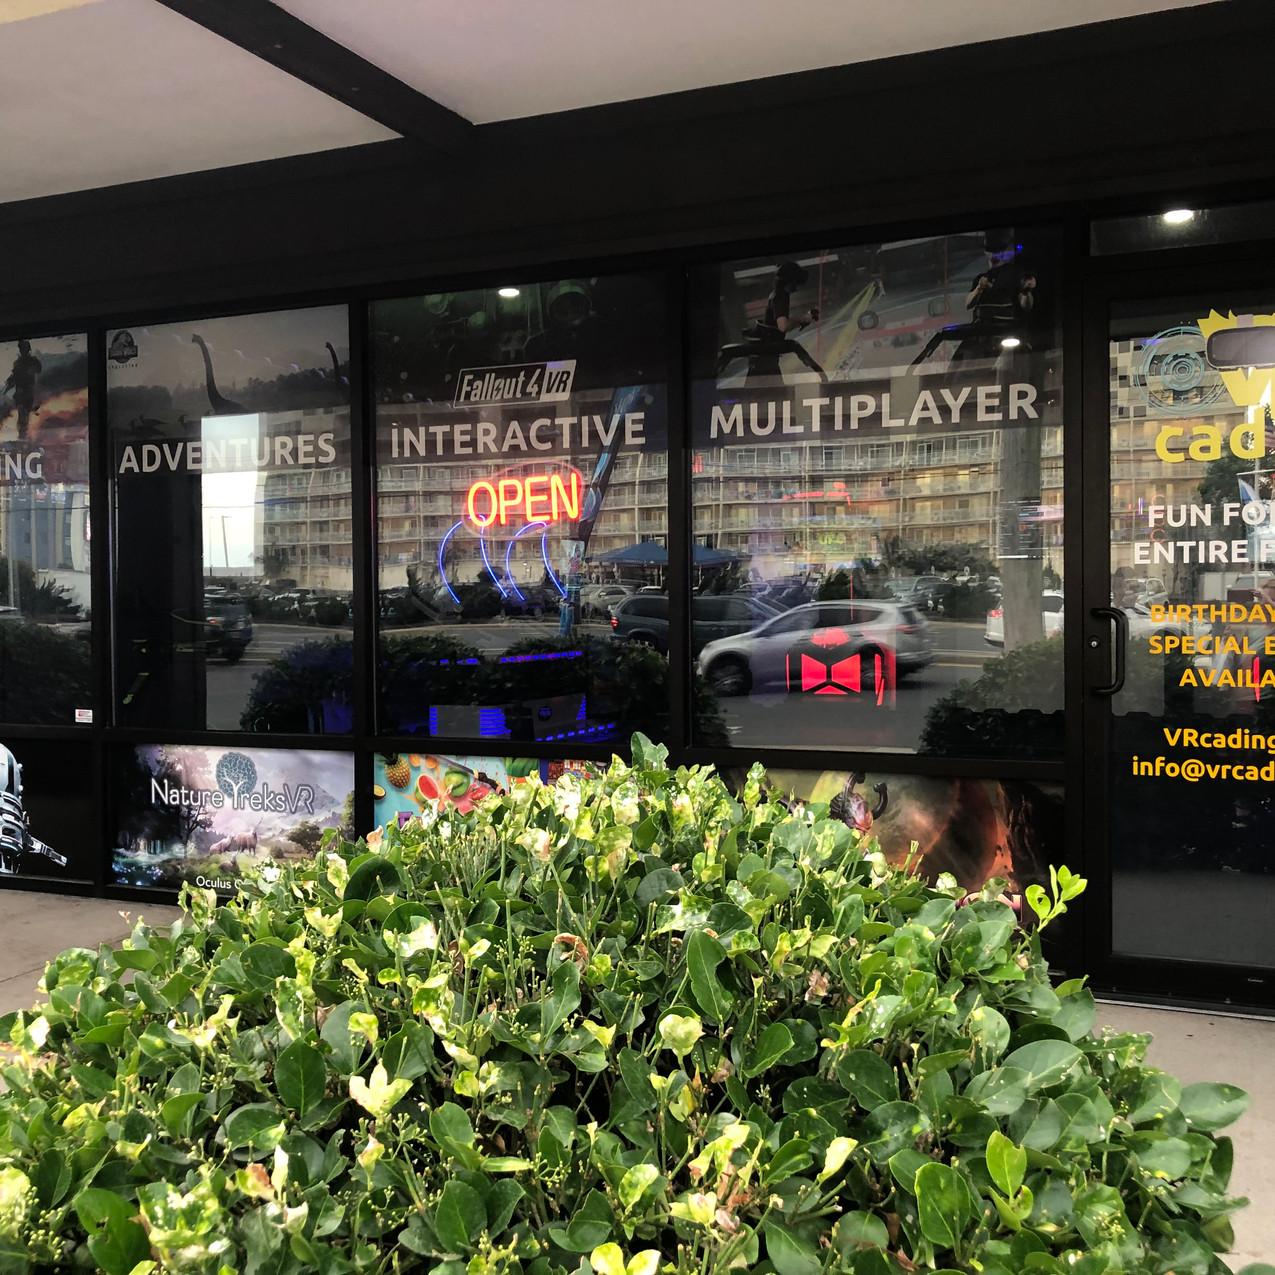 VRcading-Uptown-Storefront